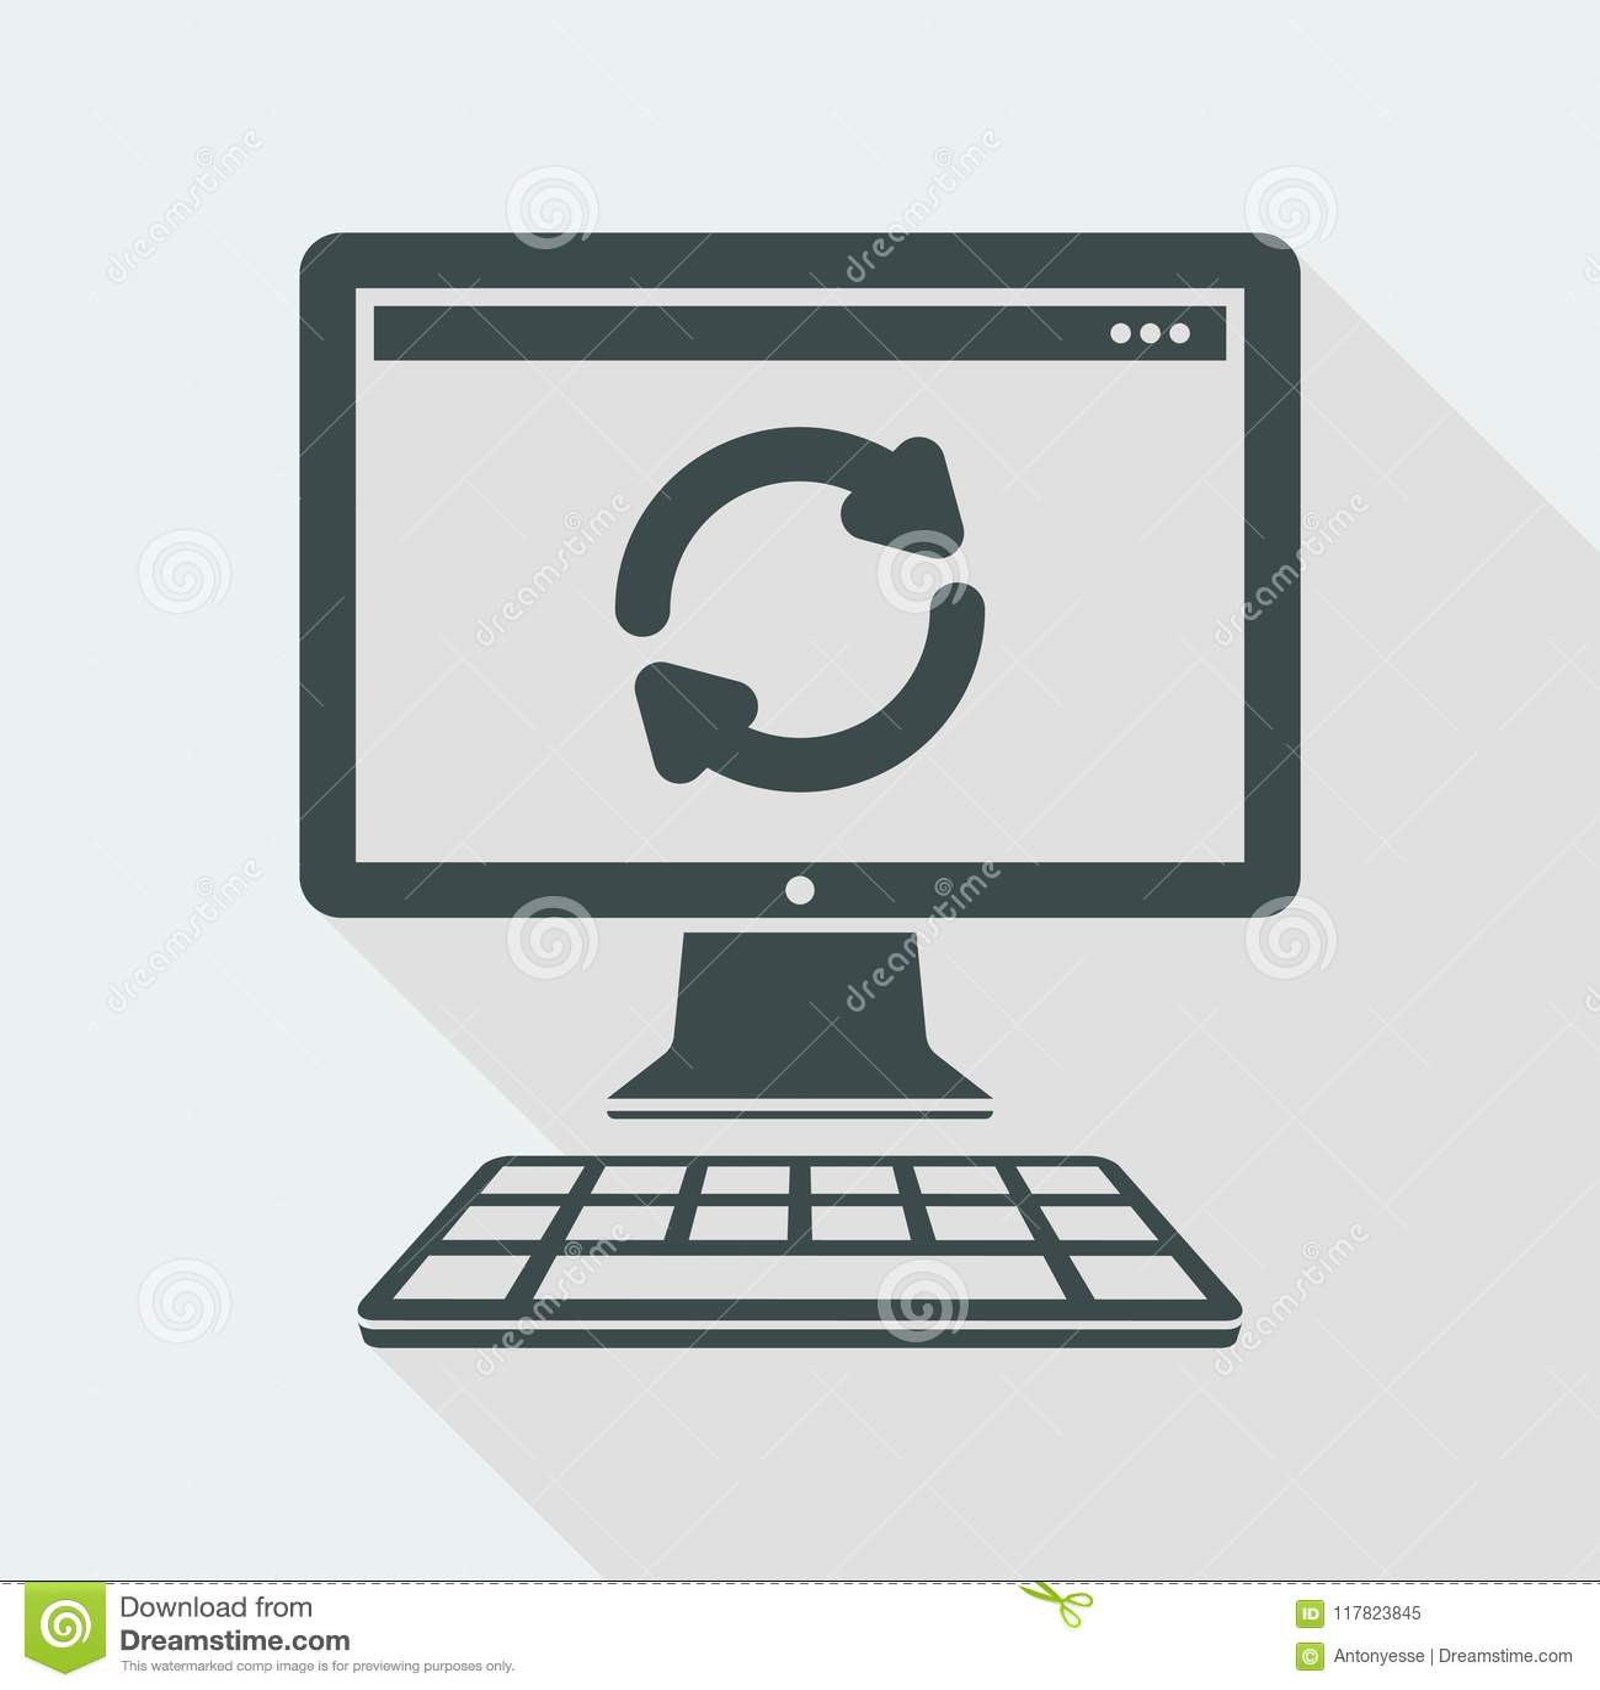 Refresh Computer - Vector Flat Minimal Icon Stock Vector